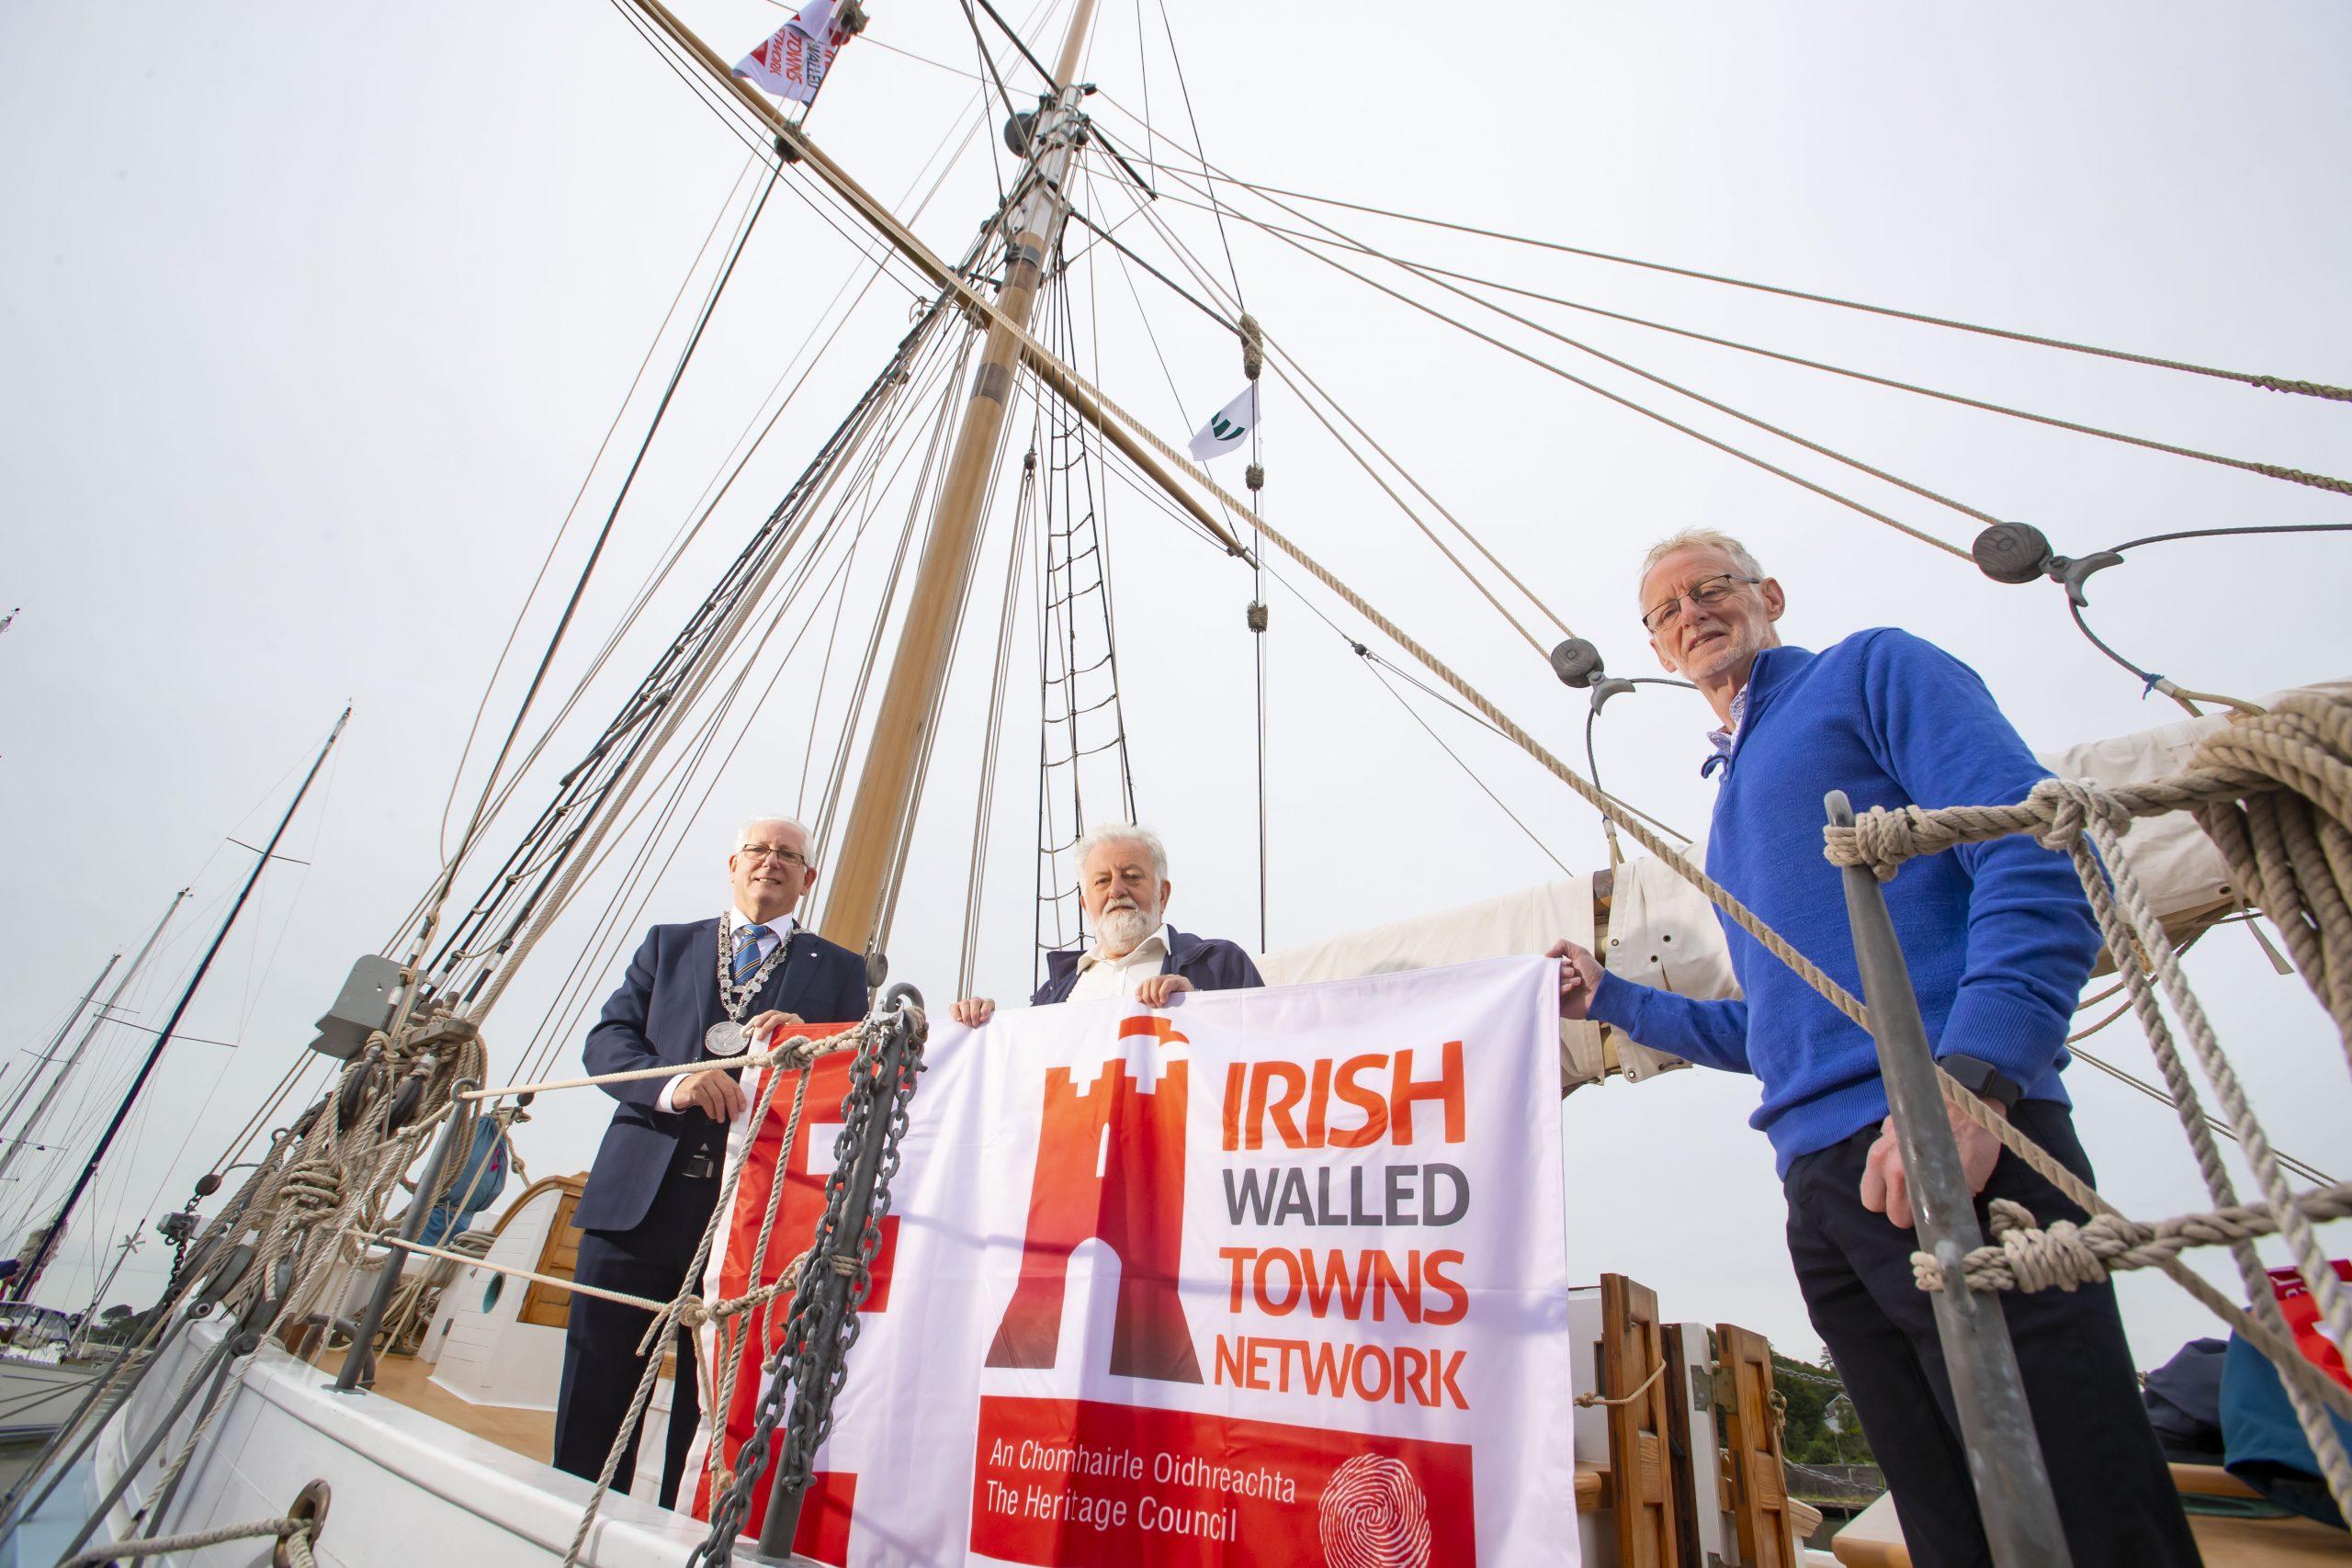 Irish Walled Towns Network